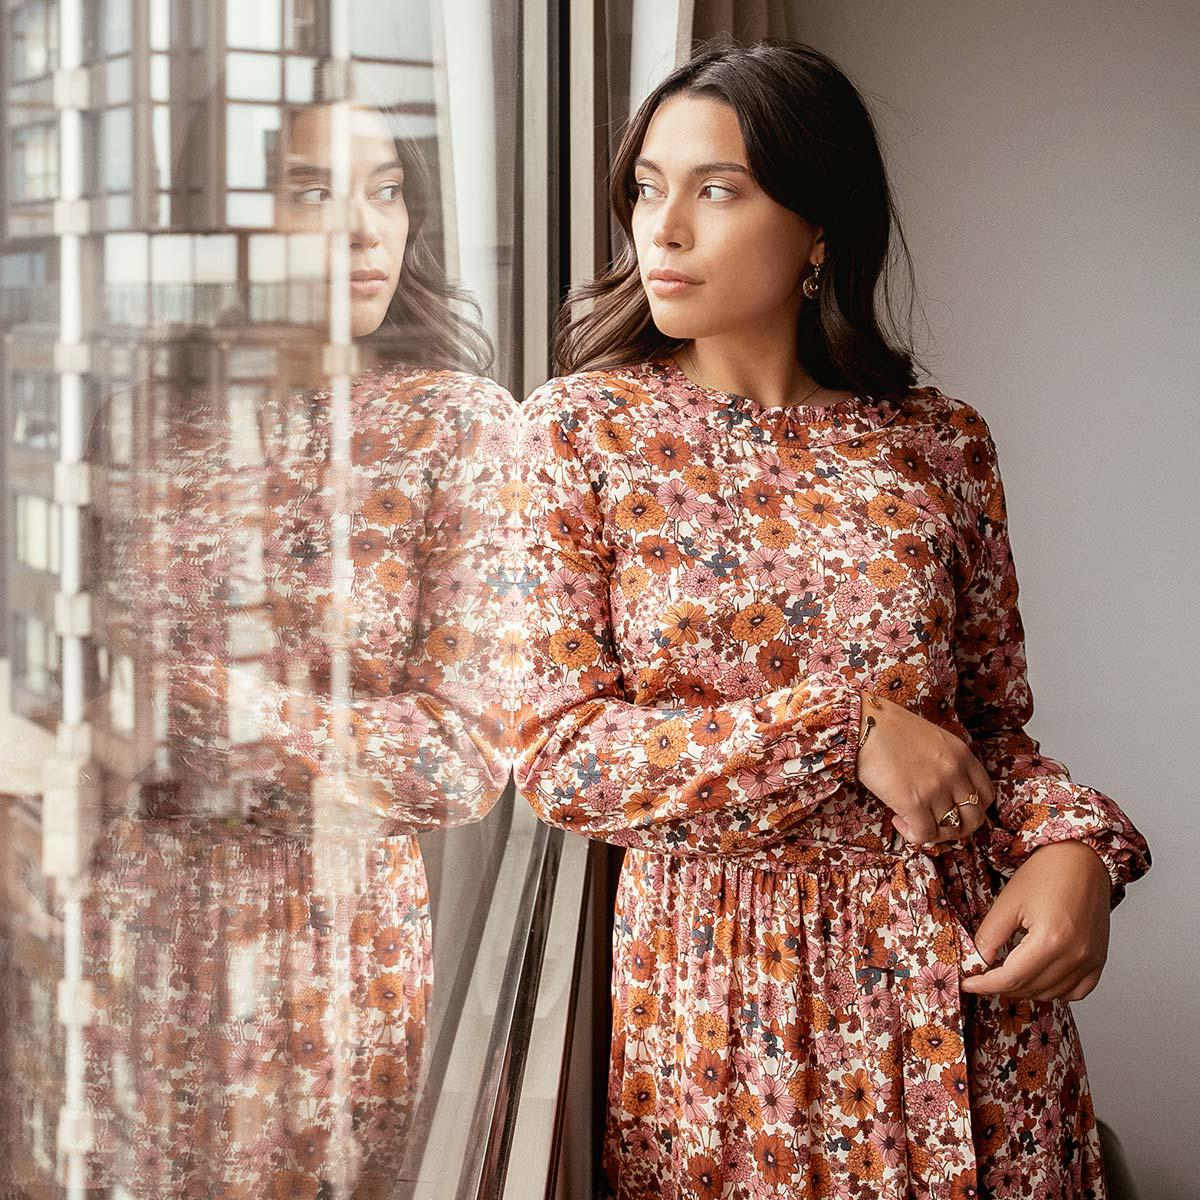 Robe Longue A Fleurs Claudia Reedition 3 Suisses